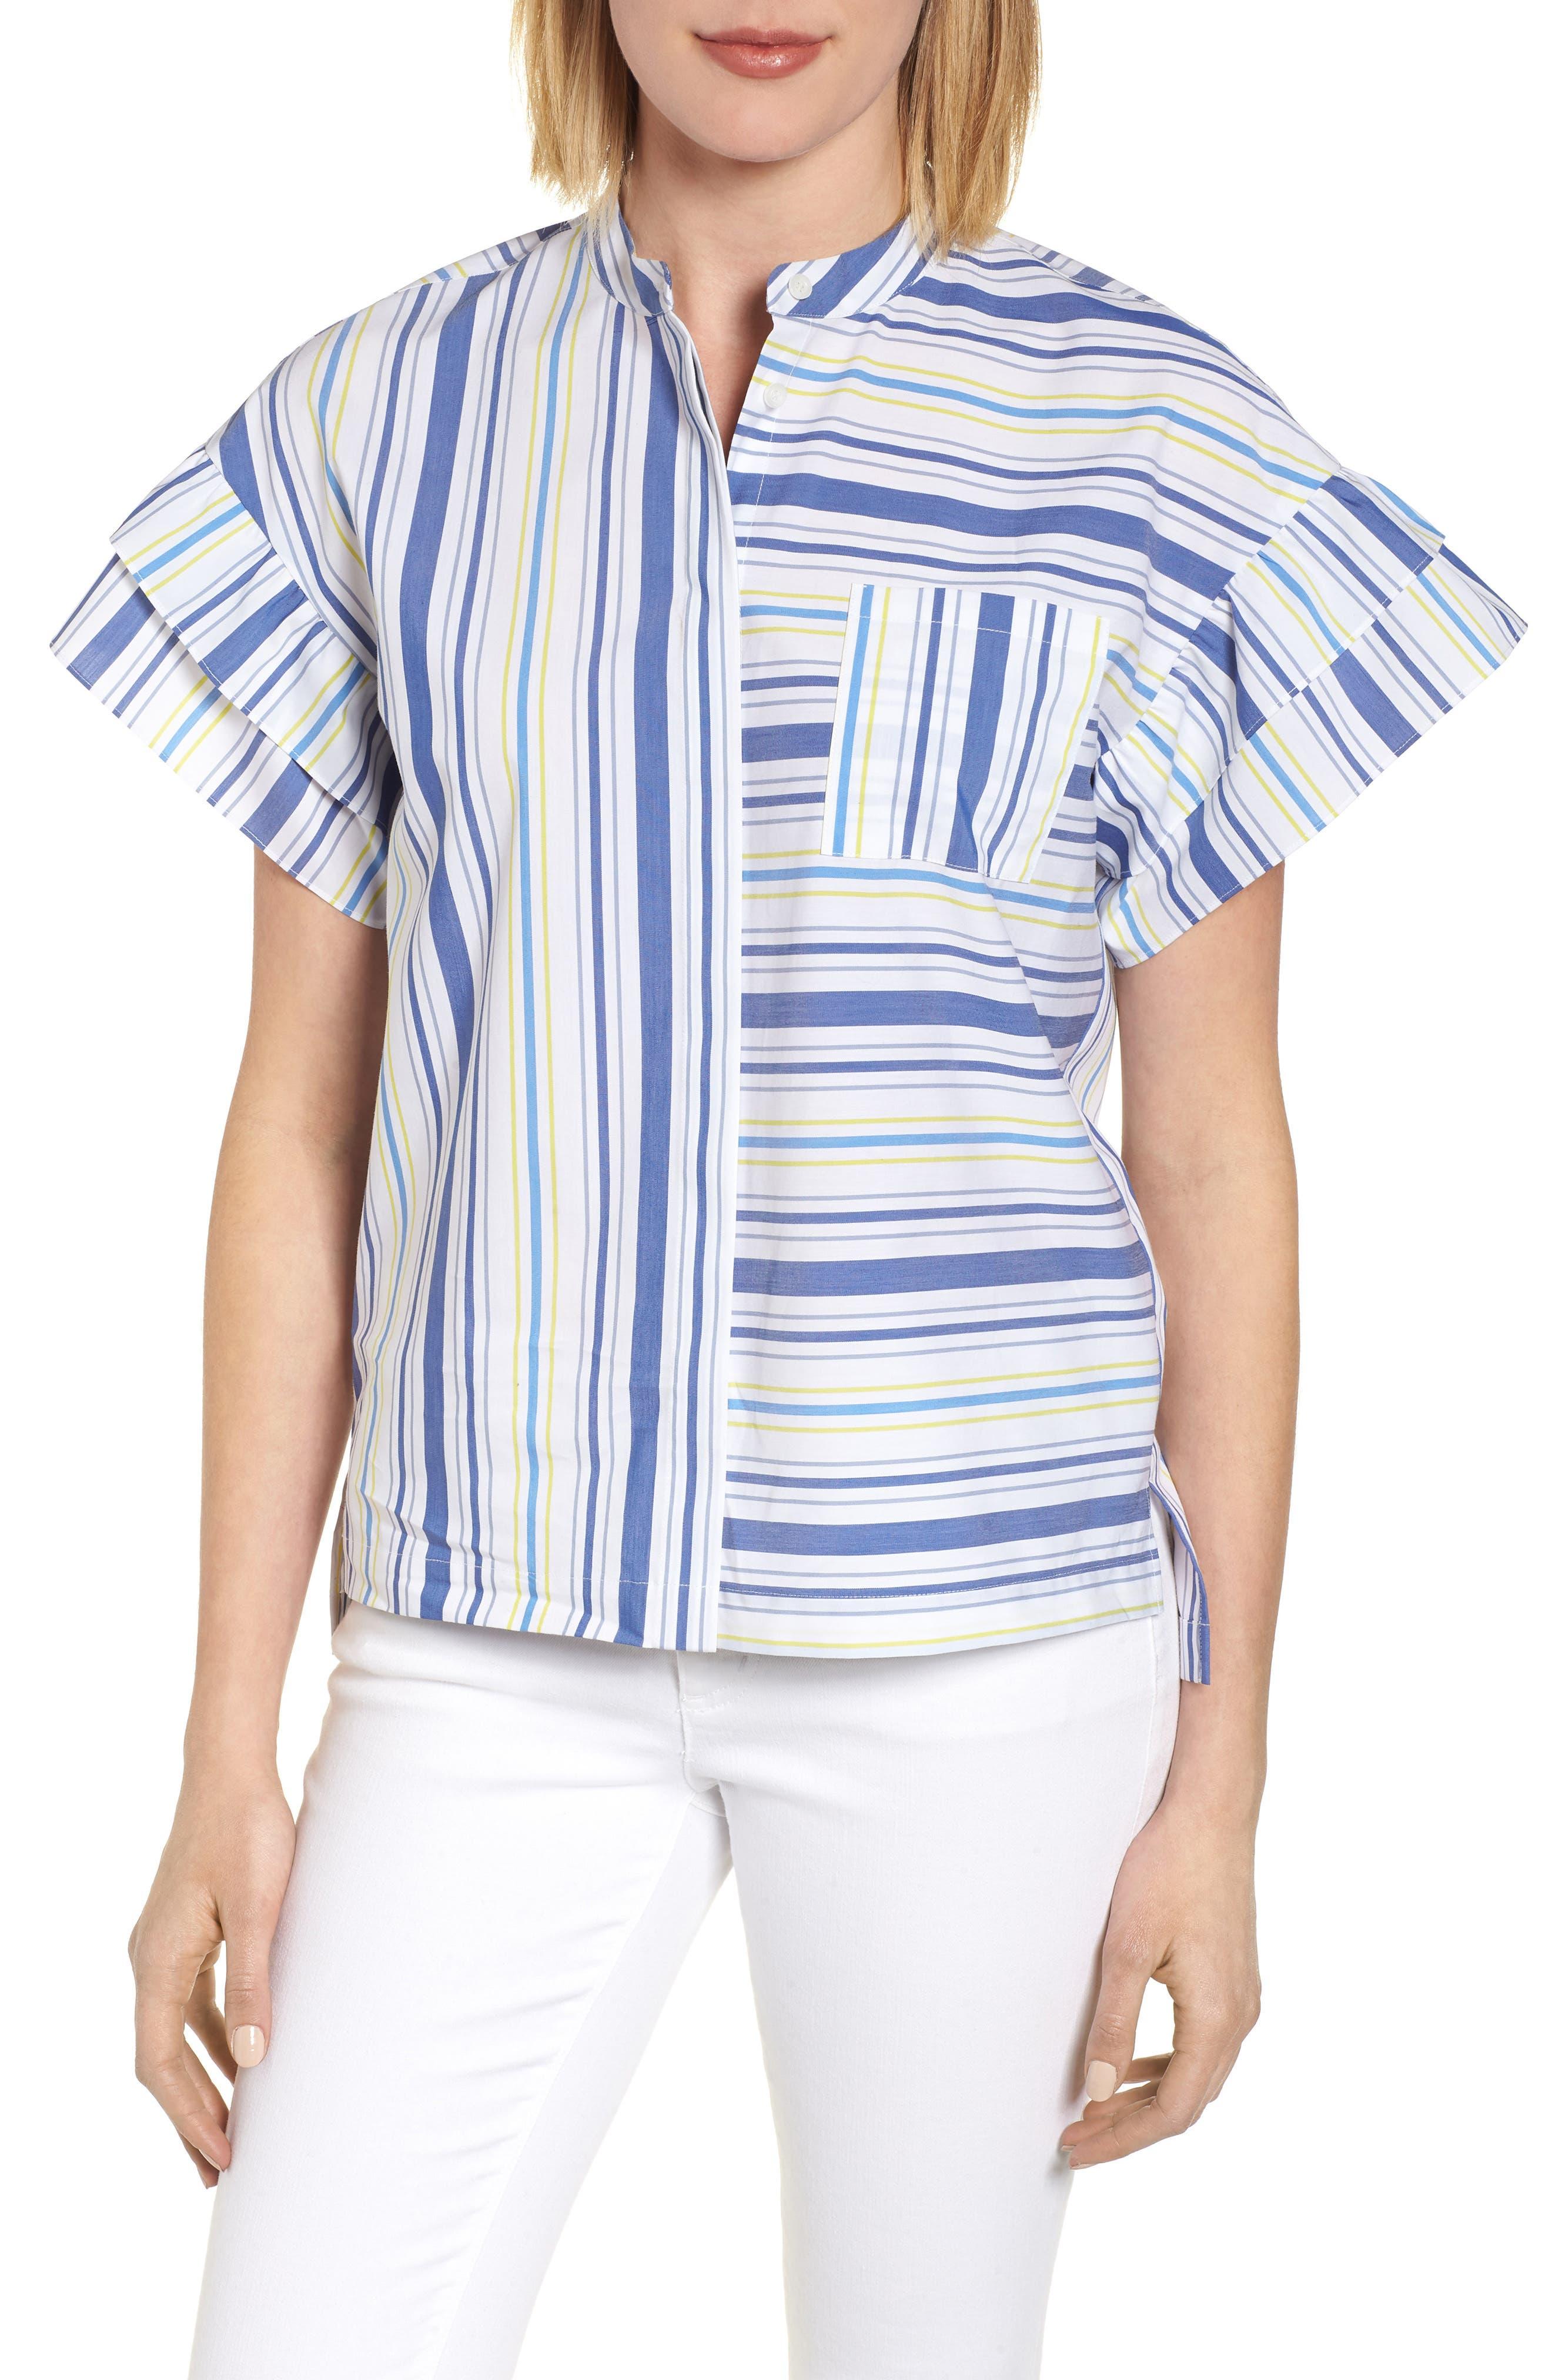 Ruffle Sleeve Stretch Cotton Blend Blouse,                             Main thumbnail 1, color,                             White Multi Stripe